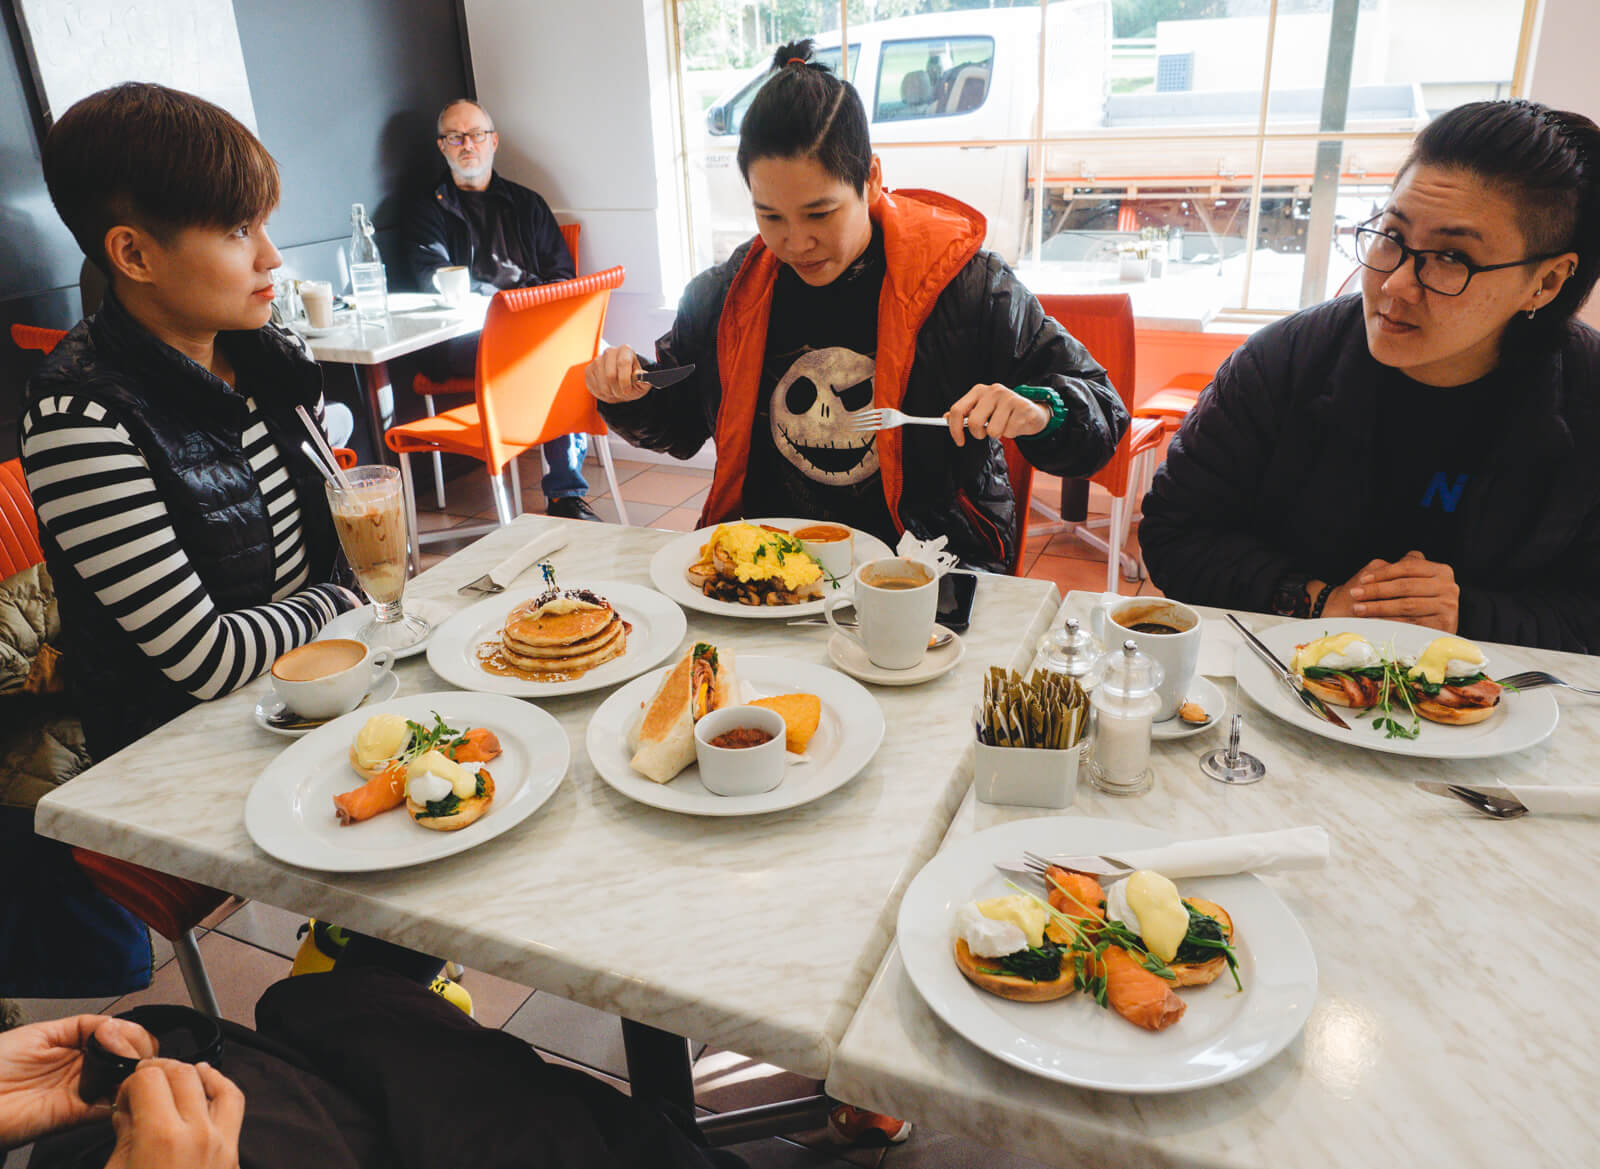 Breakfast at Cosi's cafe, Albany